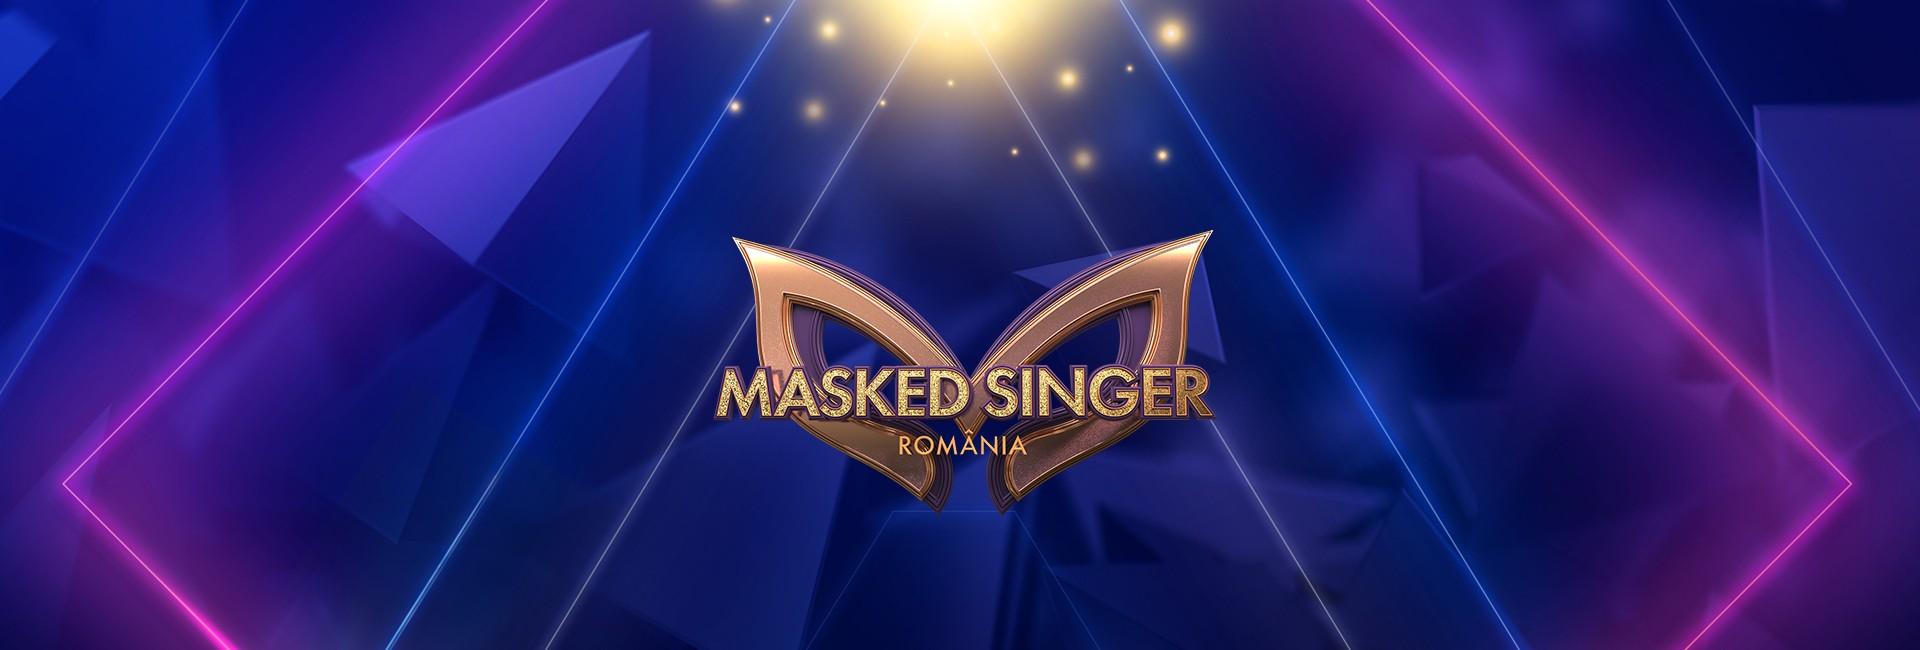 MASKED SINGER ROMANIA